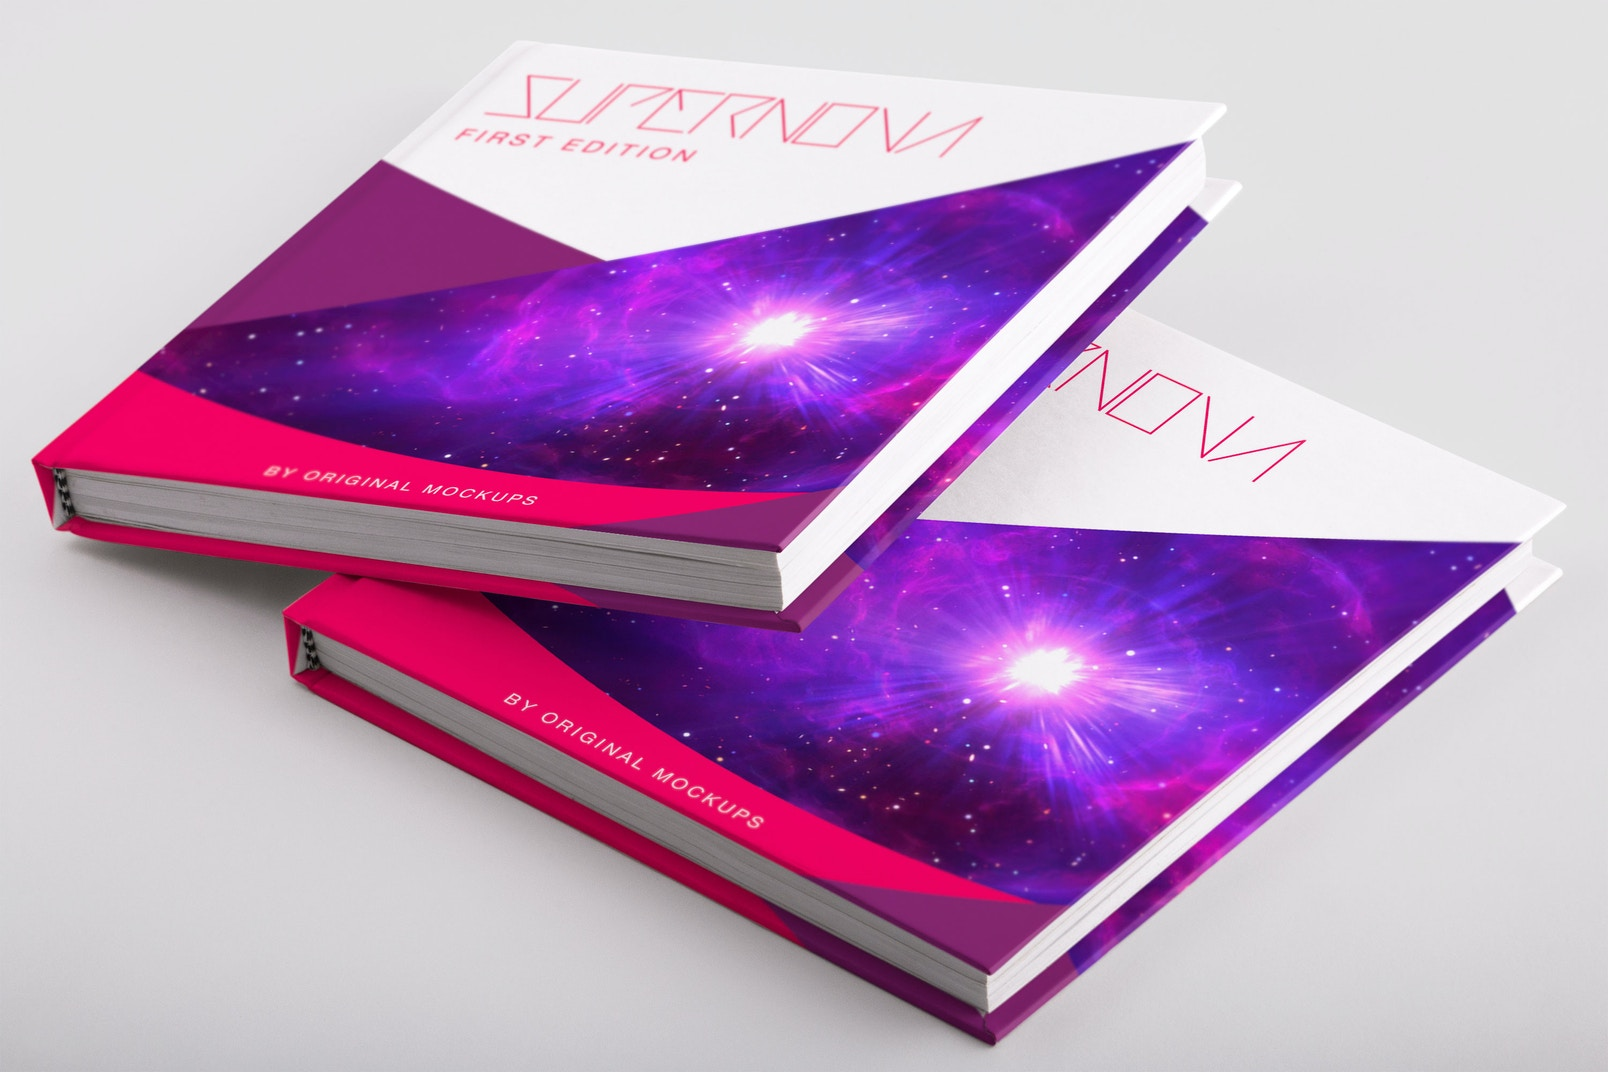 Hardcover Small Square Book PSD Mockup 03